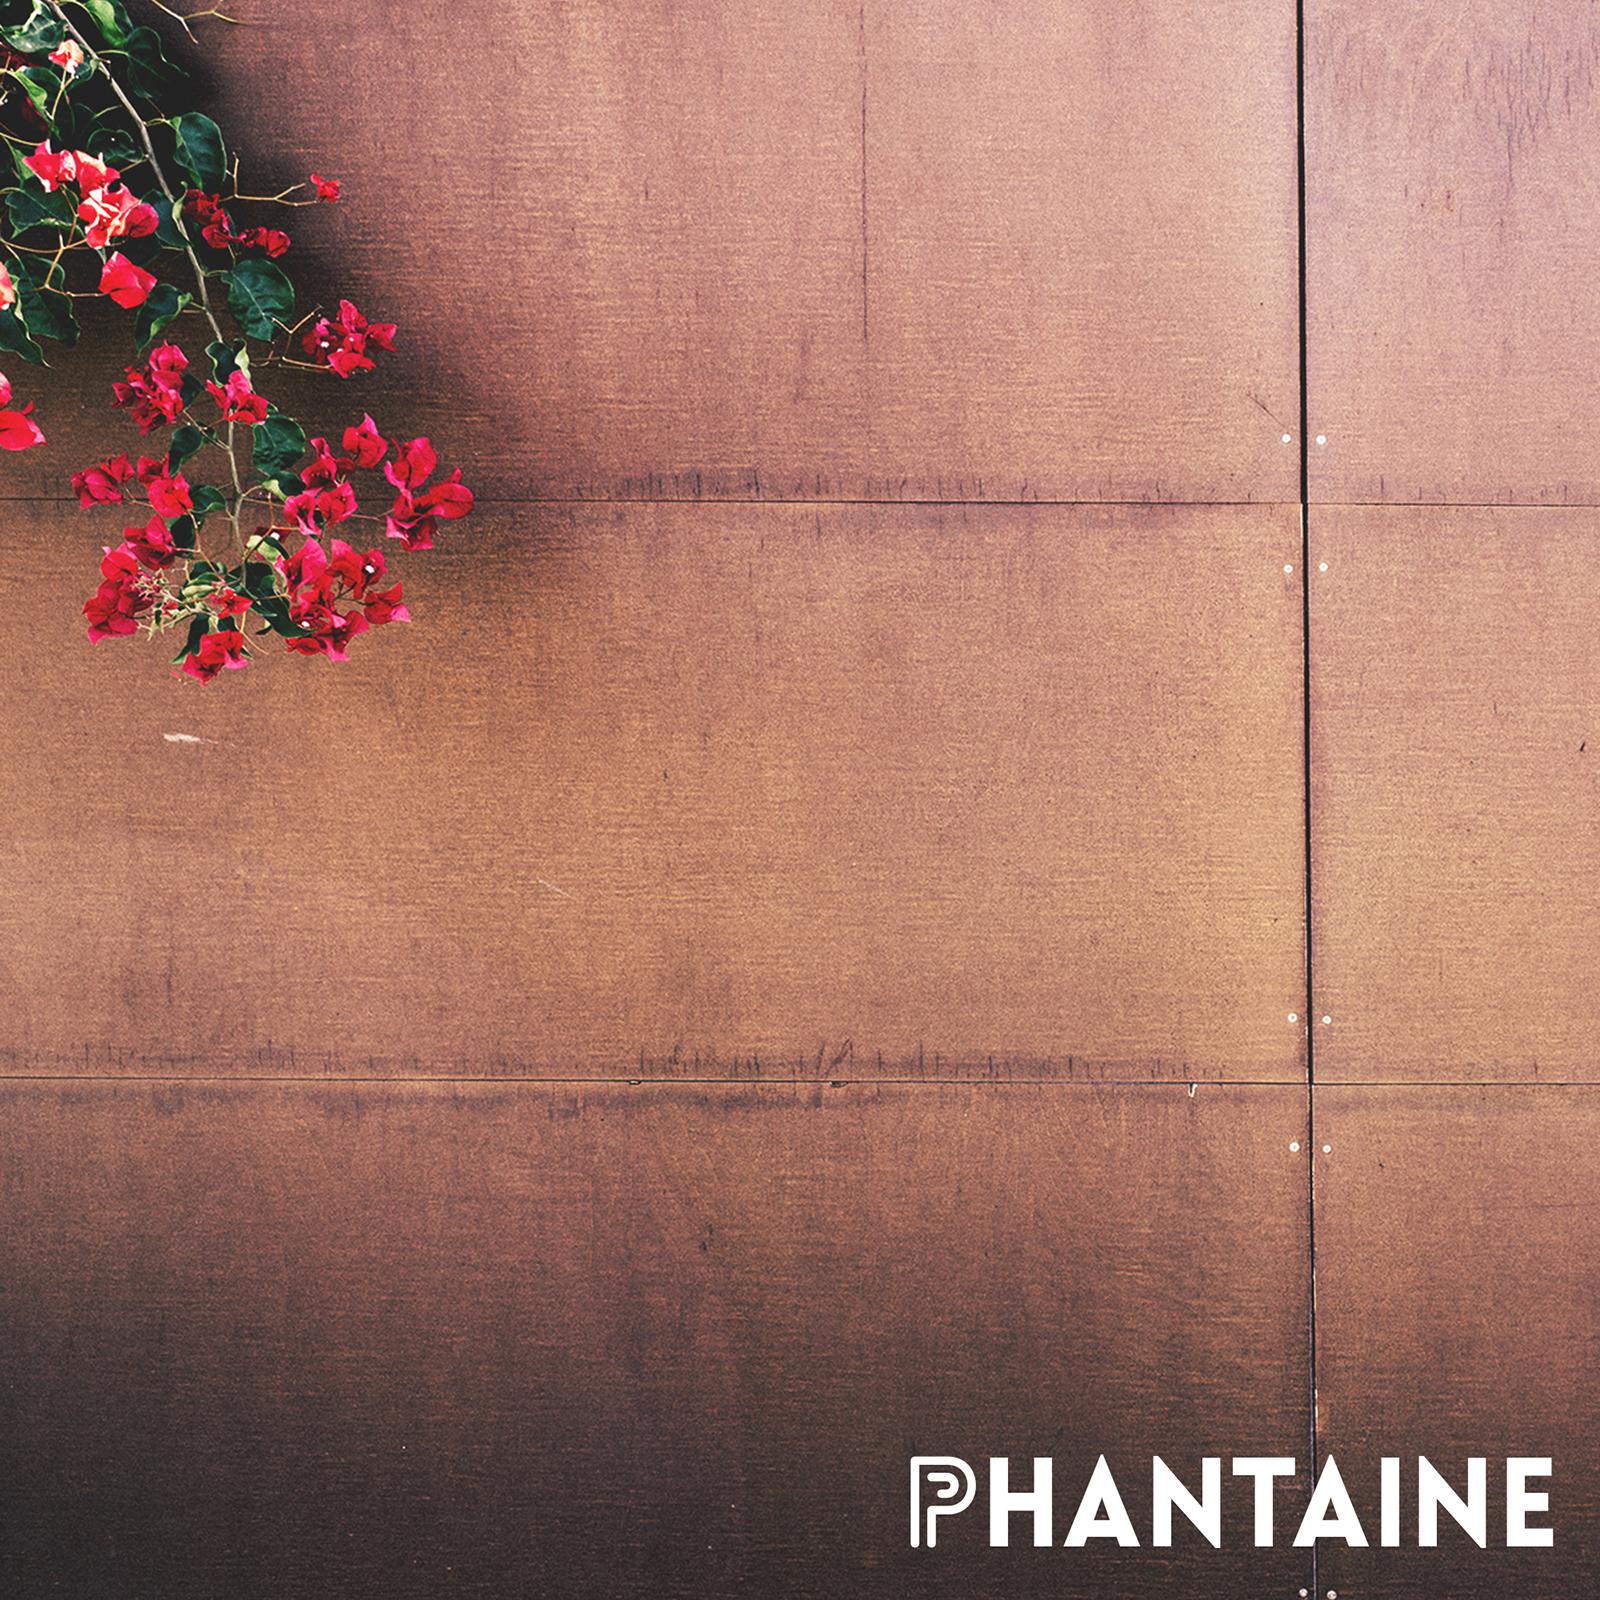 Phantaine Wall Flower (logo lower right).jpg